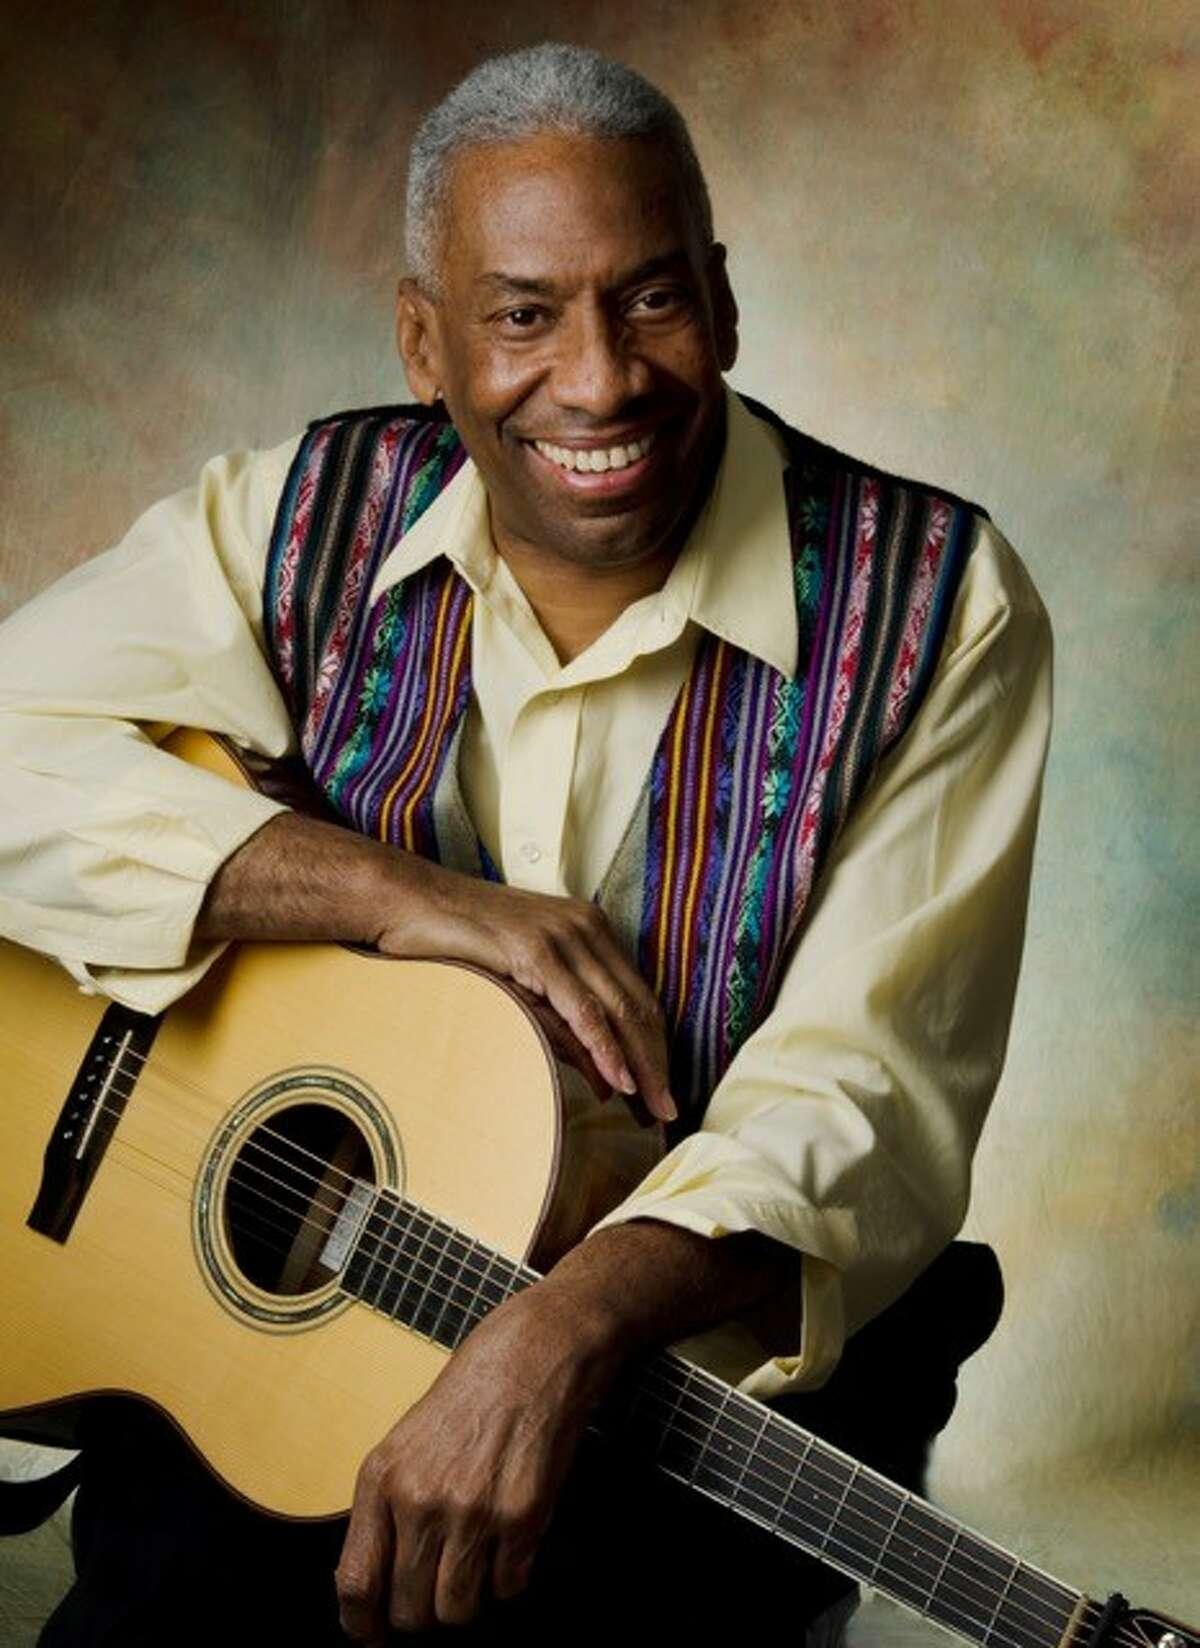 Folk singer-songwriter, guitarist and educator Reggie Harris is releasing his newest album,